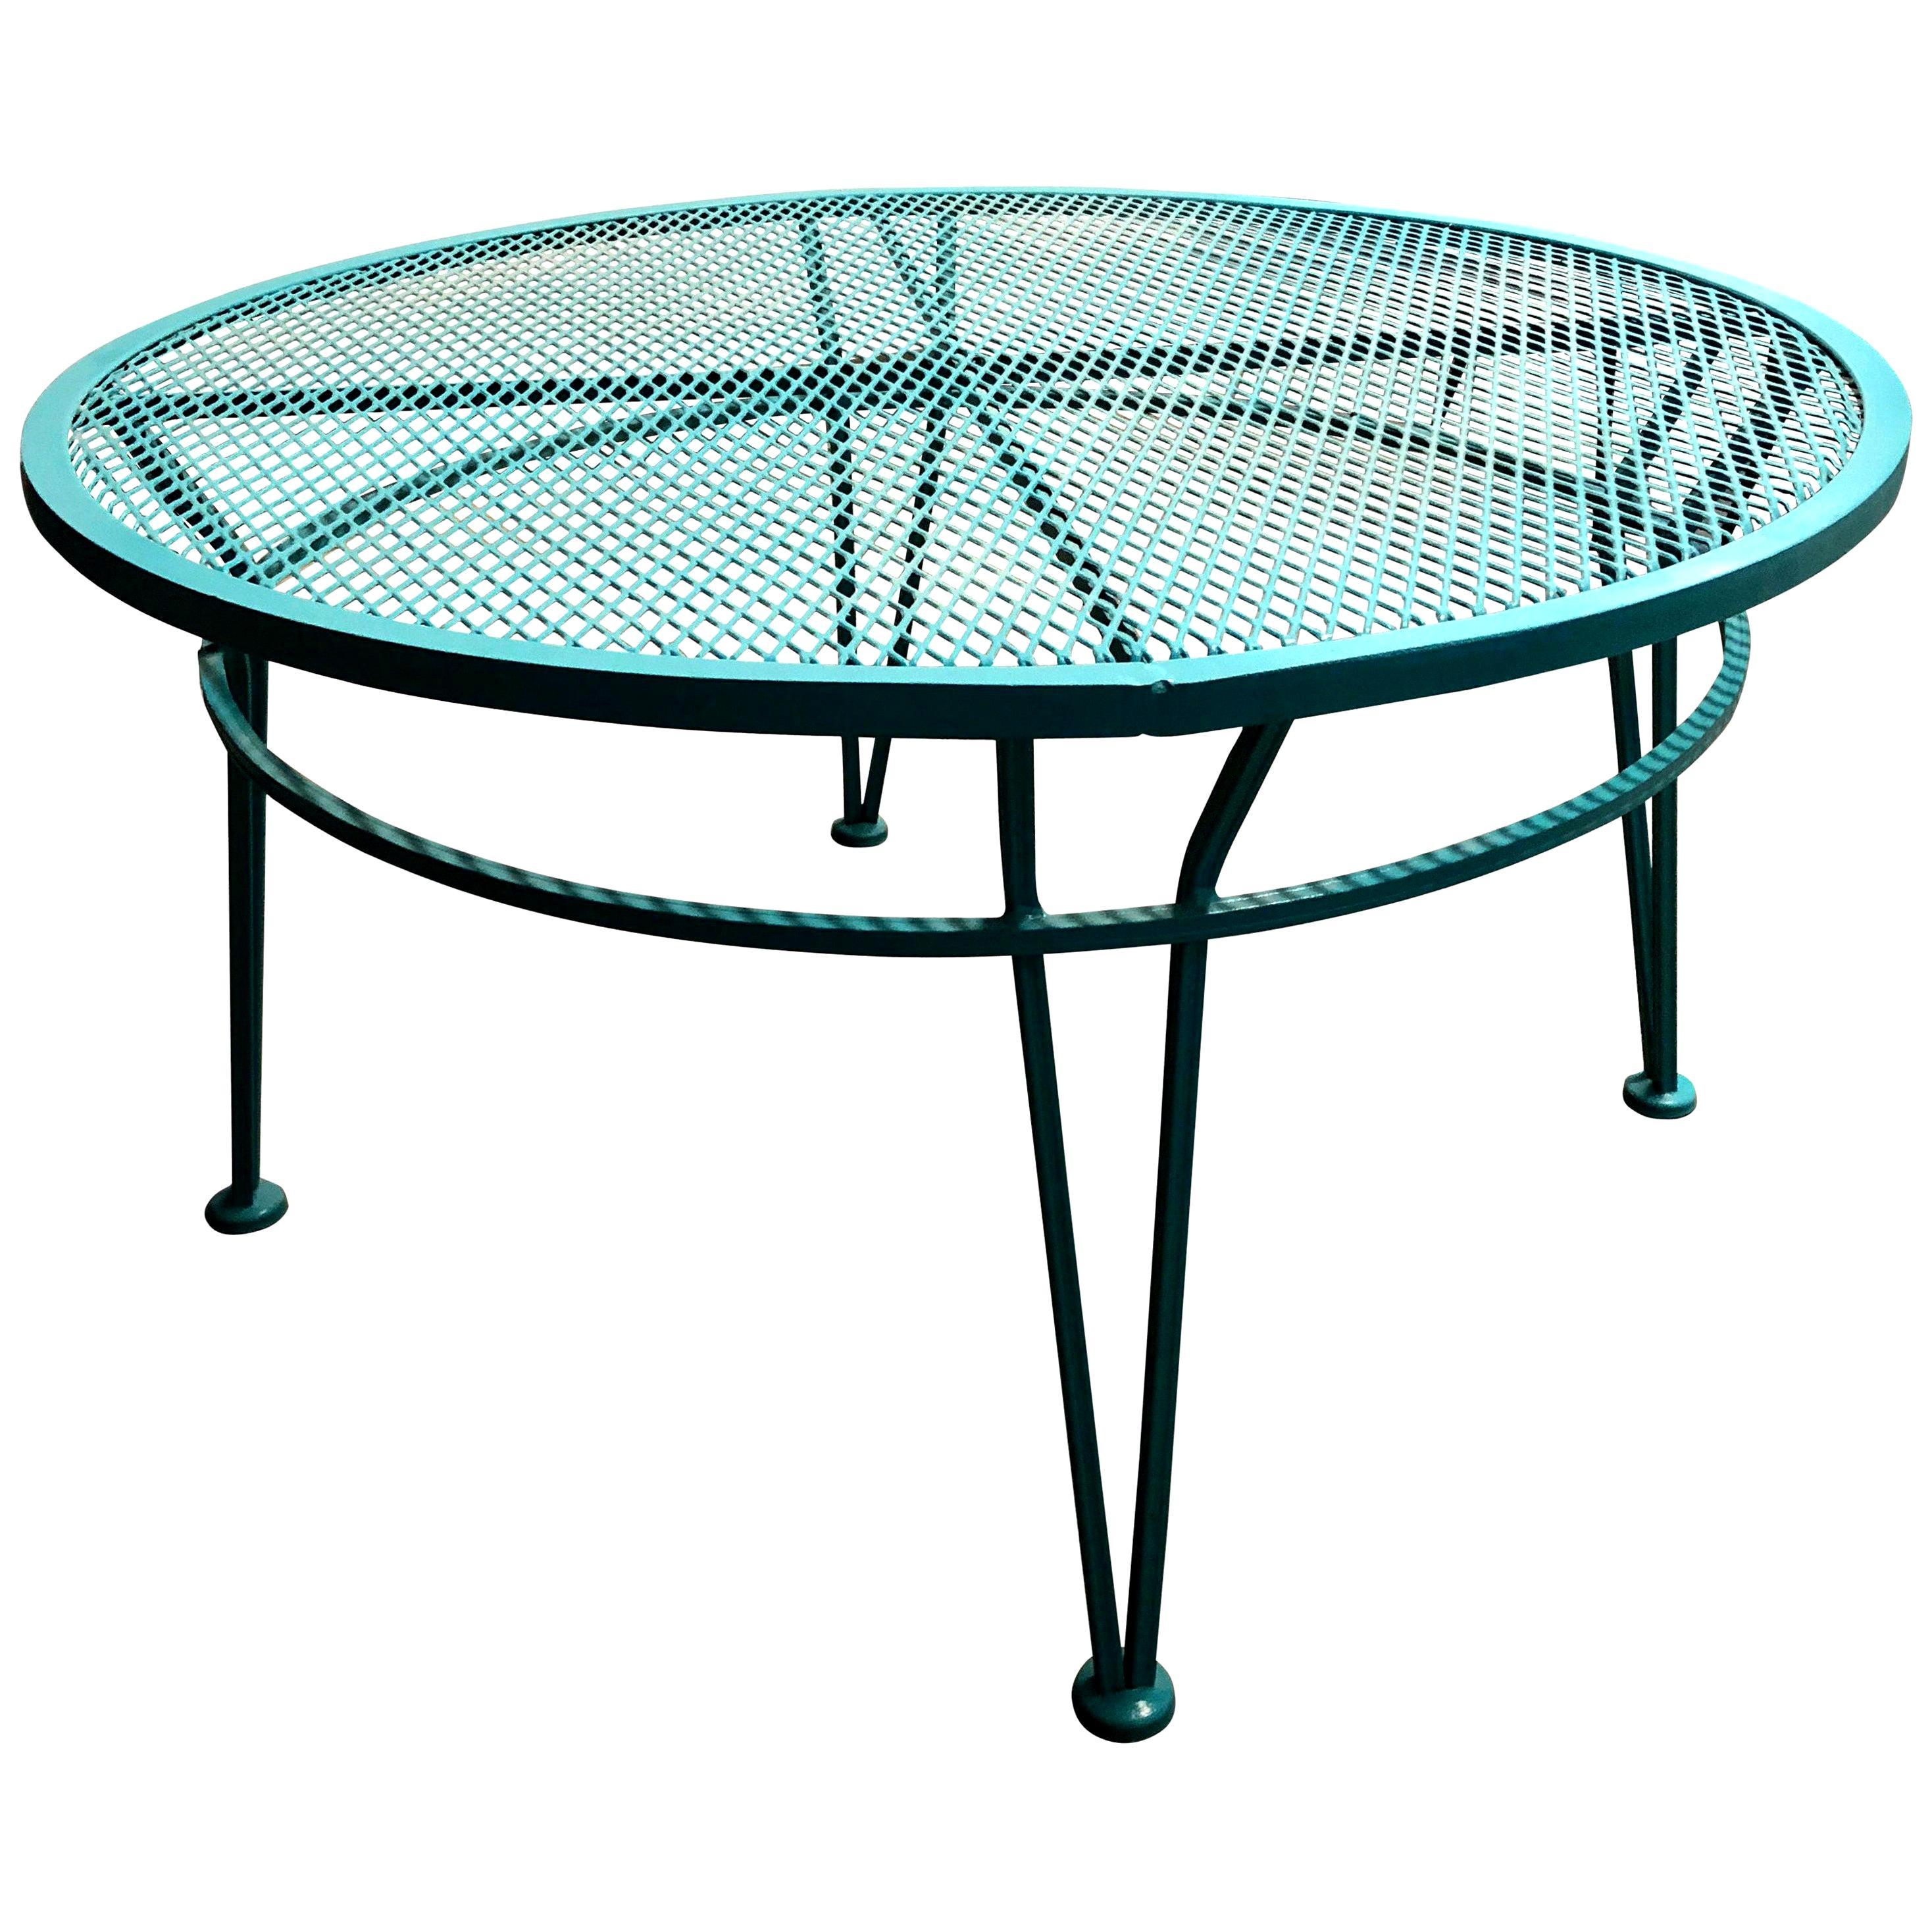 "Salterini Newly Enameled Blue Wrought Iron Patio / Garden ""Radar"" Cocktail Table"